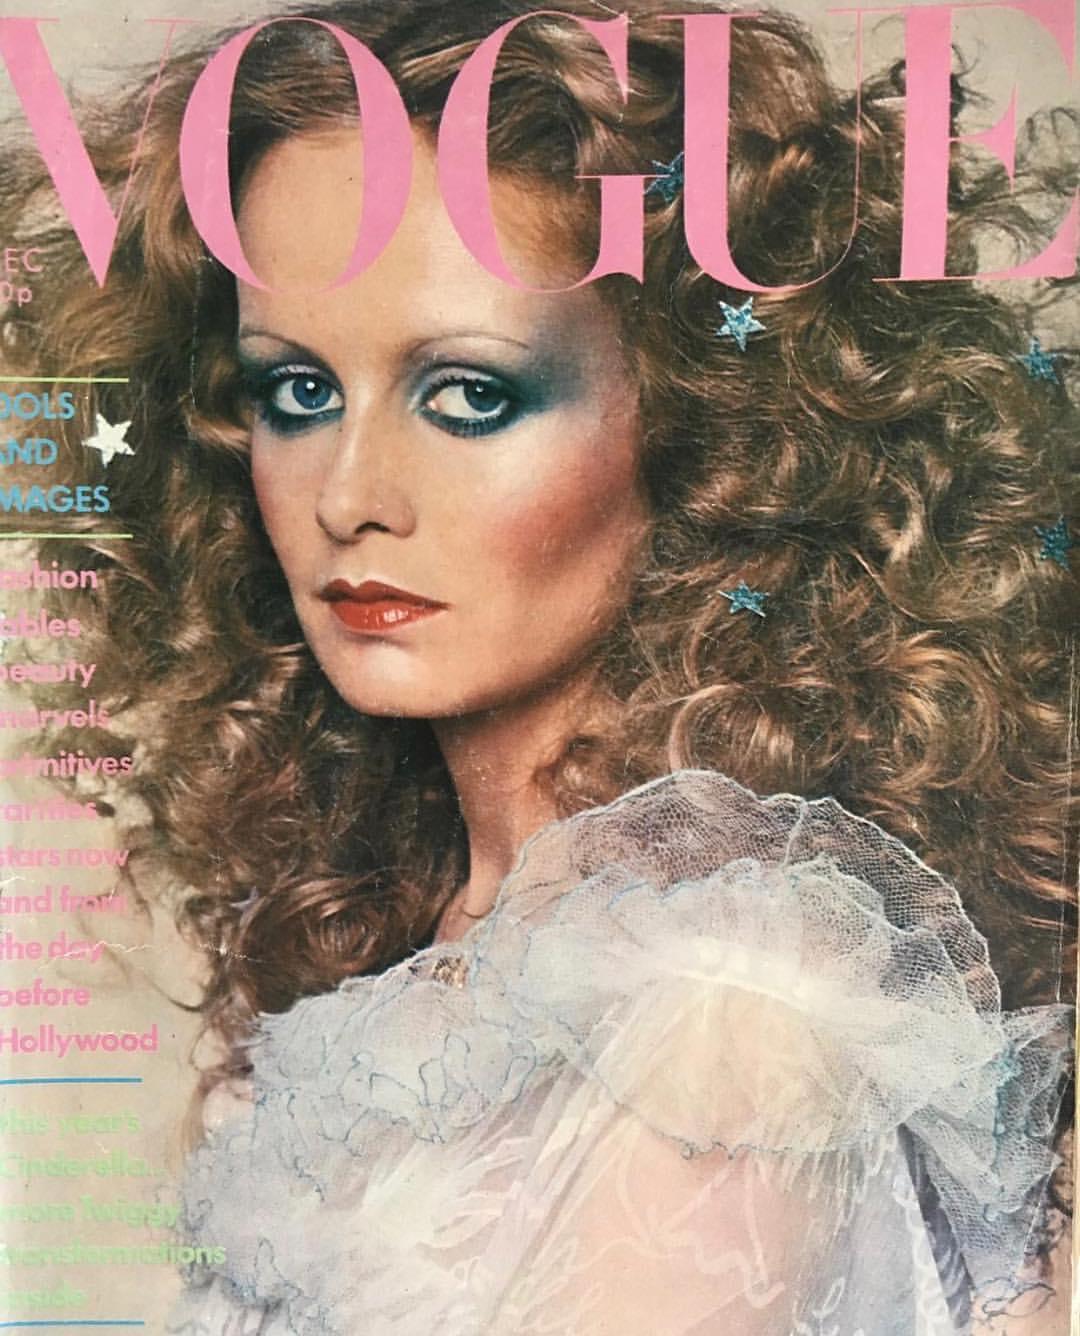 Twiggy shot by Barry Lategan for Vogue, Dec. 1974; wearing Zandra Rhodes, makeup by Barbara Daly. .jpg